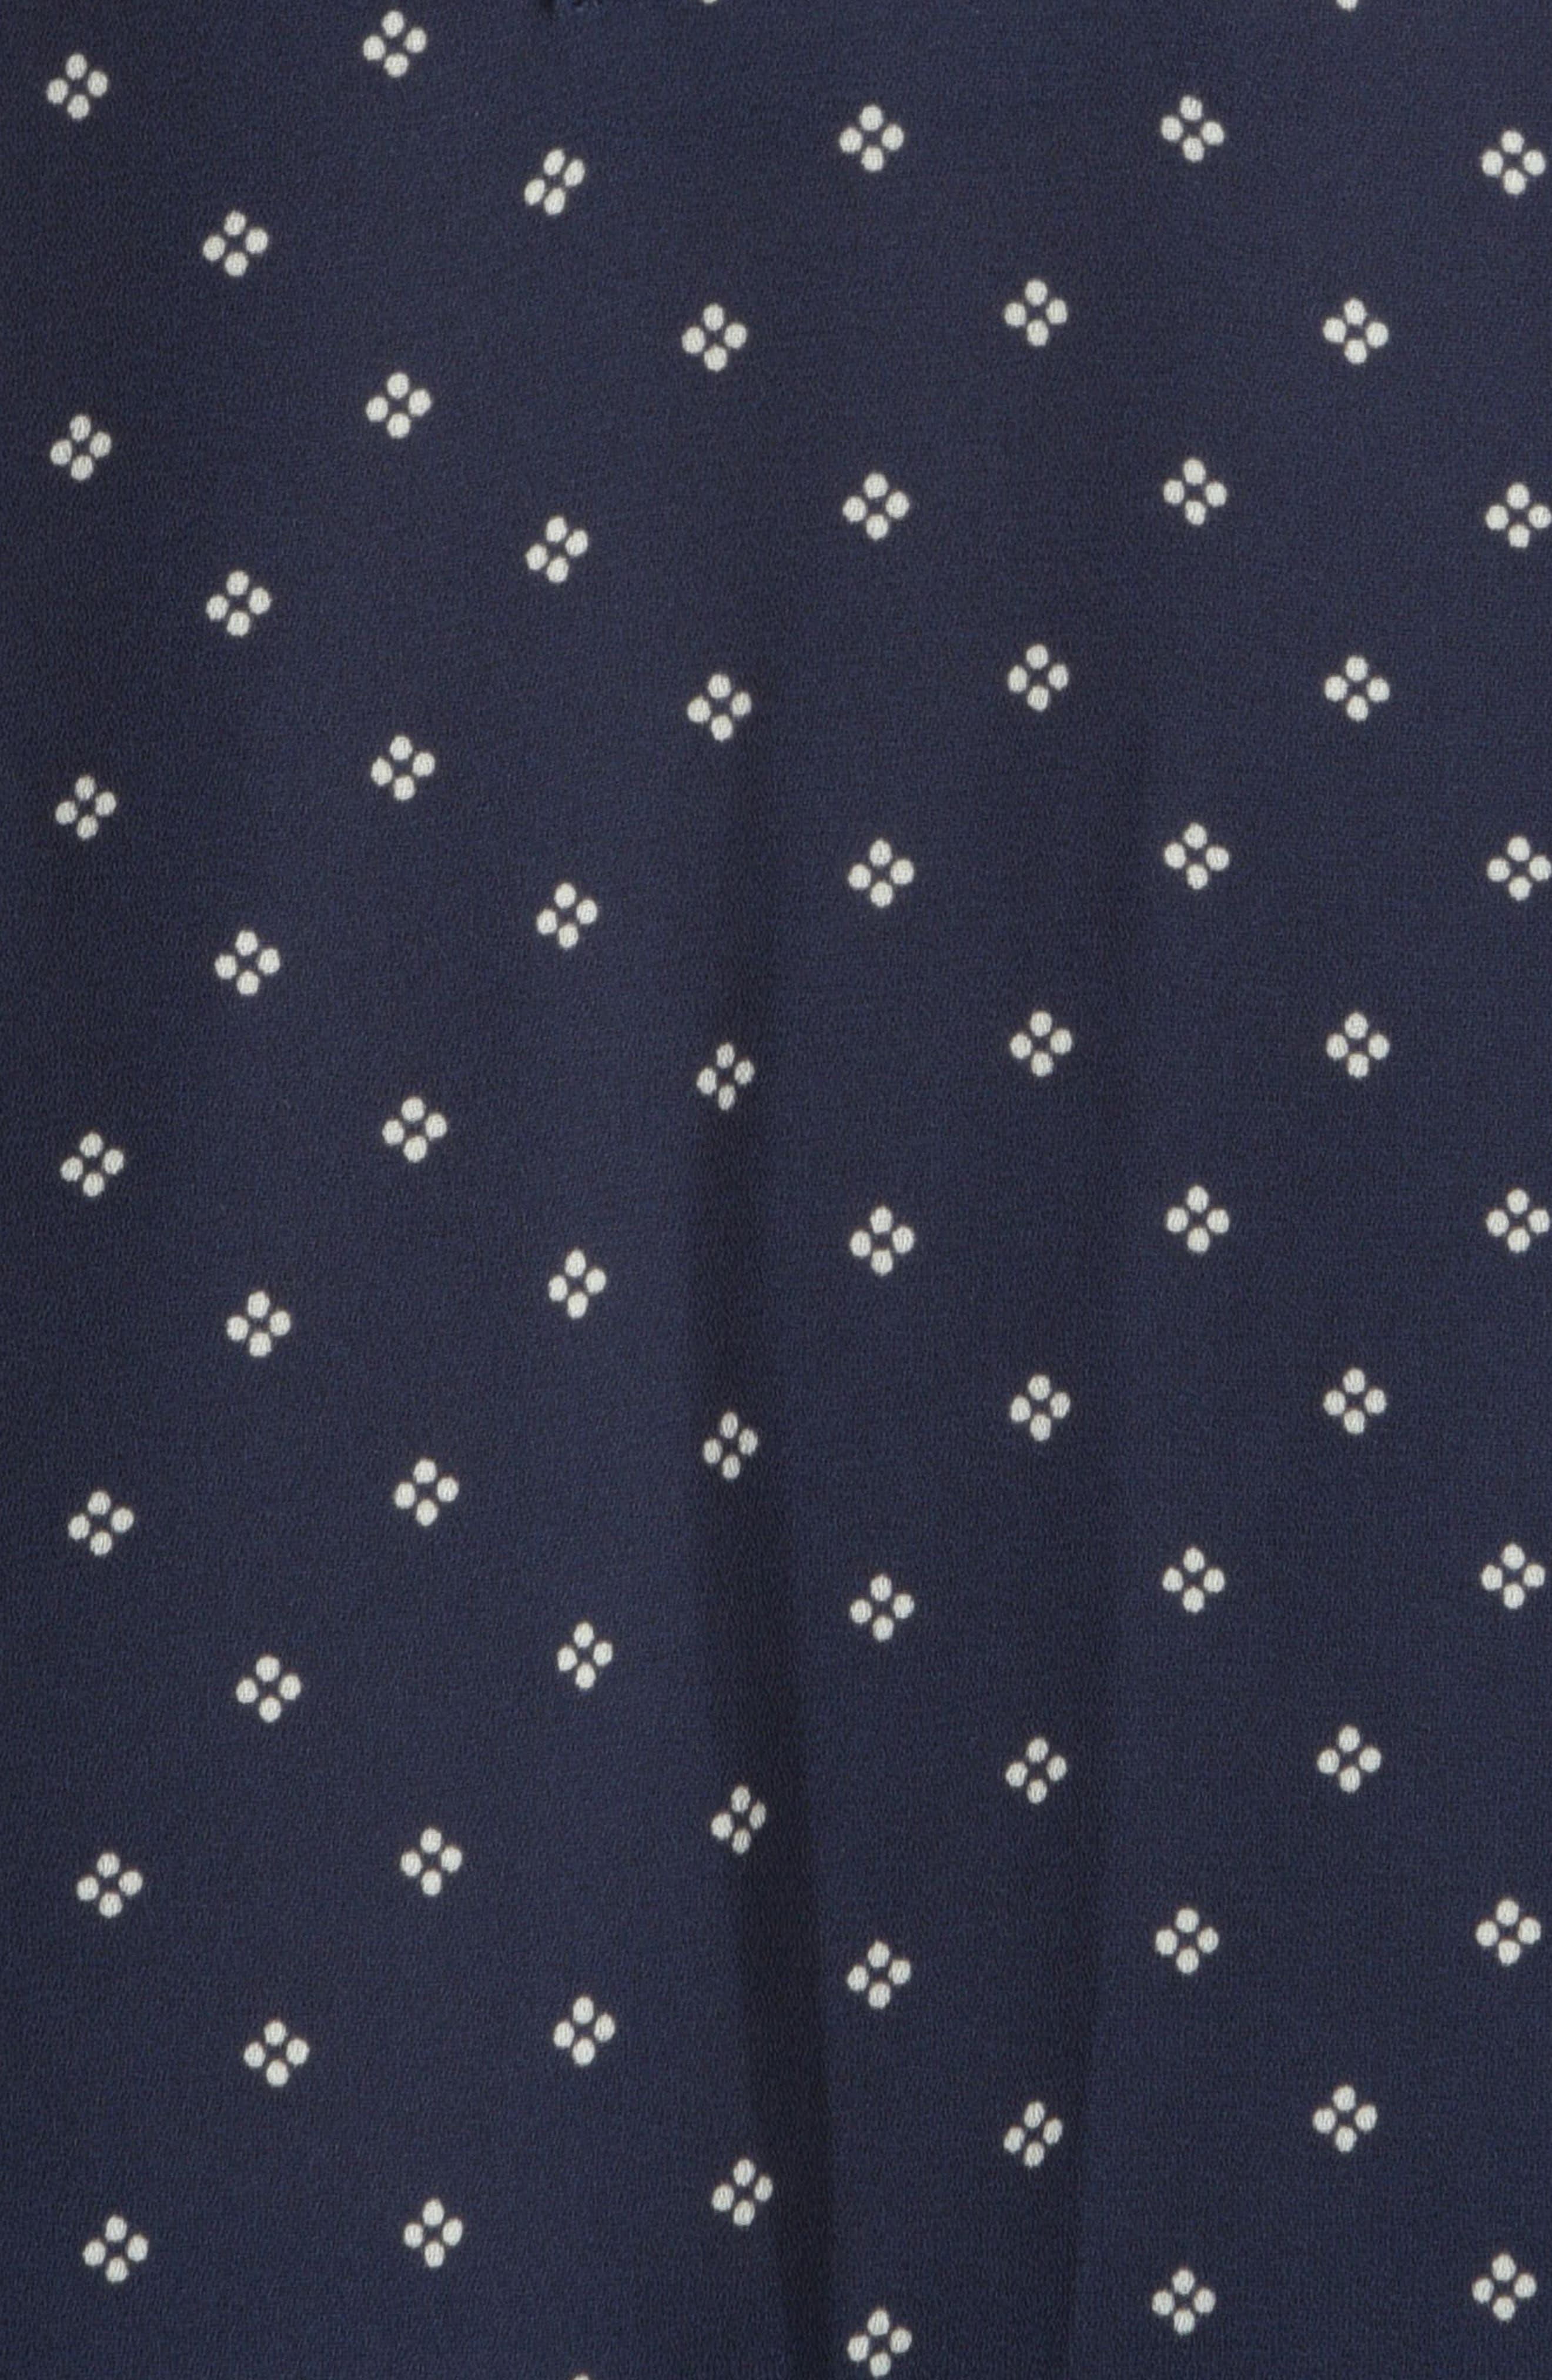 Split Collar Peasant Top,                             Alternate thumbnail 3, color,                             Arabesque Dots